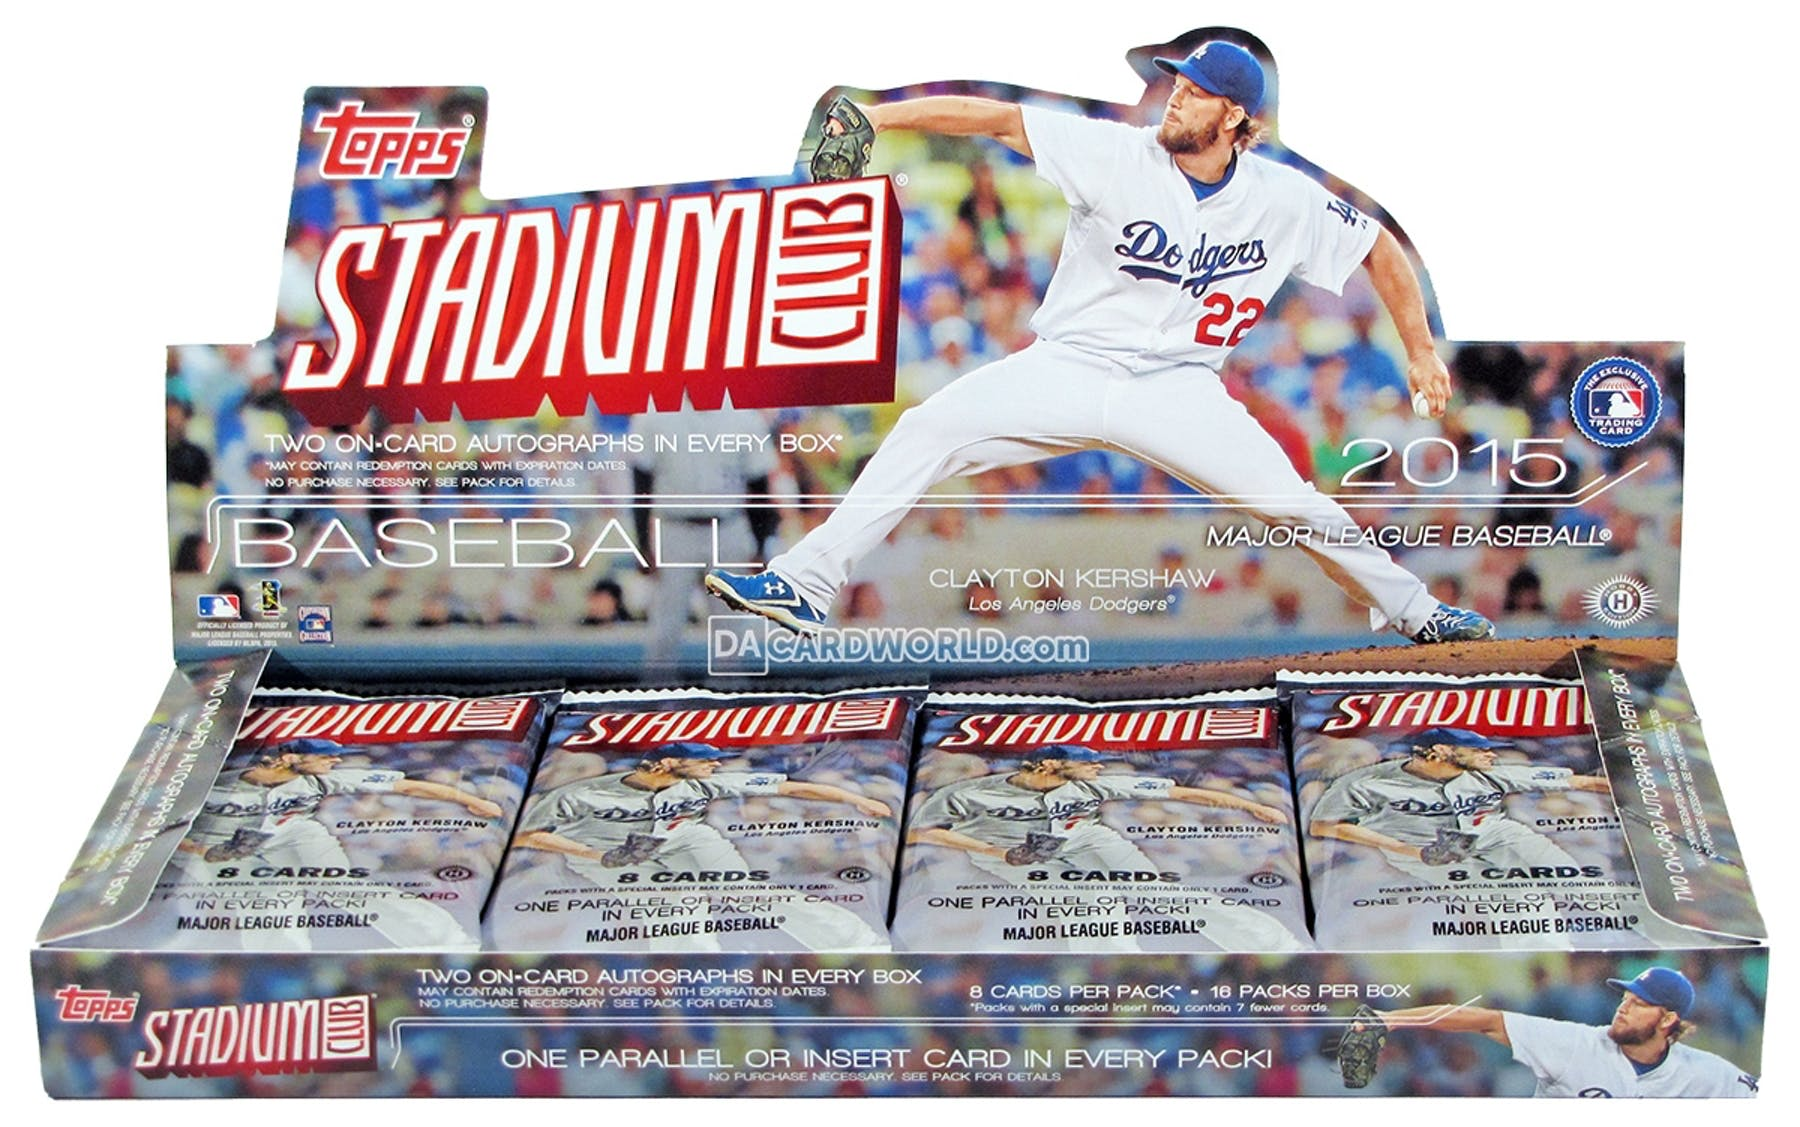 2015 Topps Stadium Club Baseball Hobby Box Da Card World